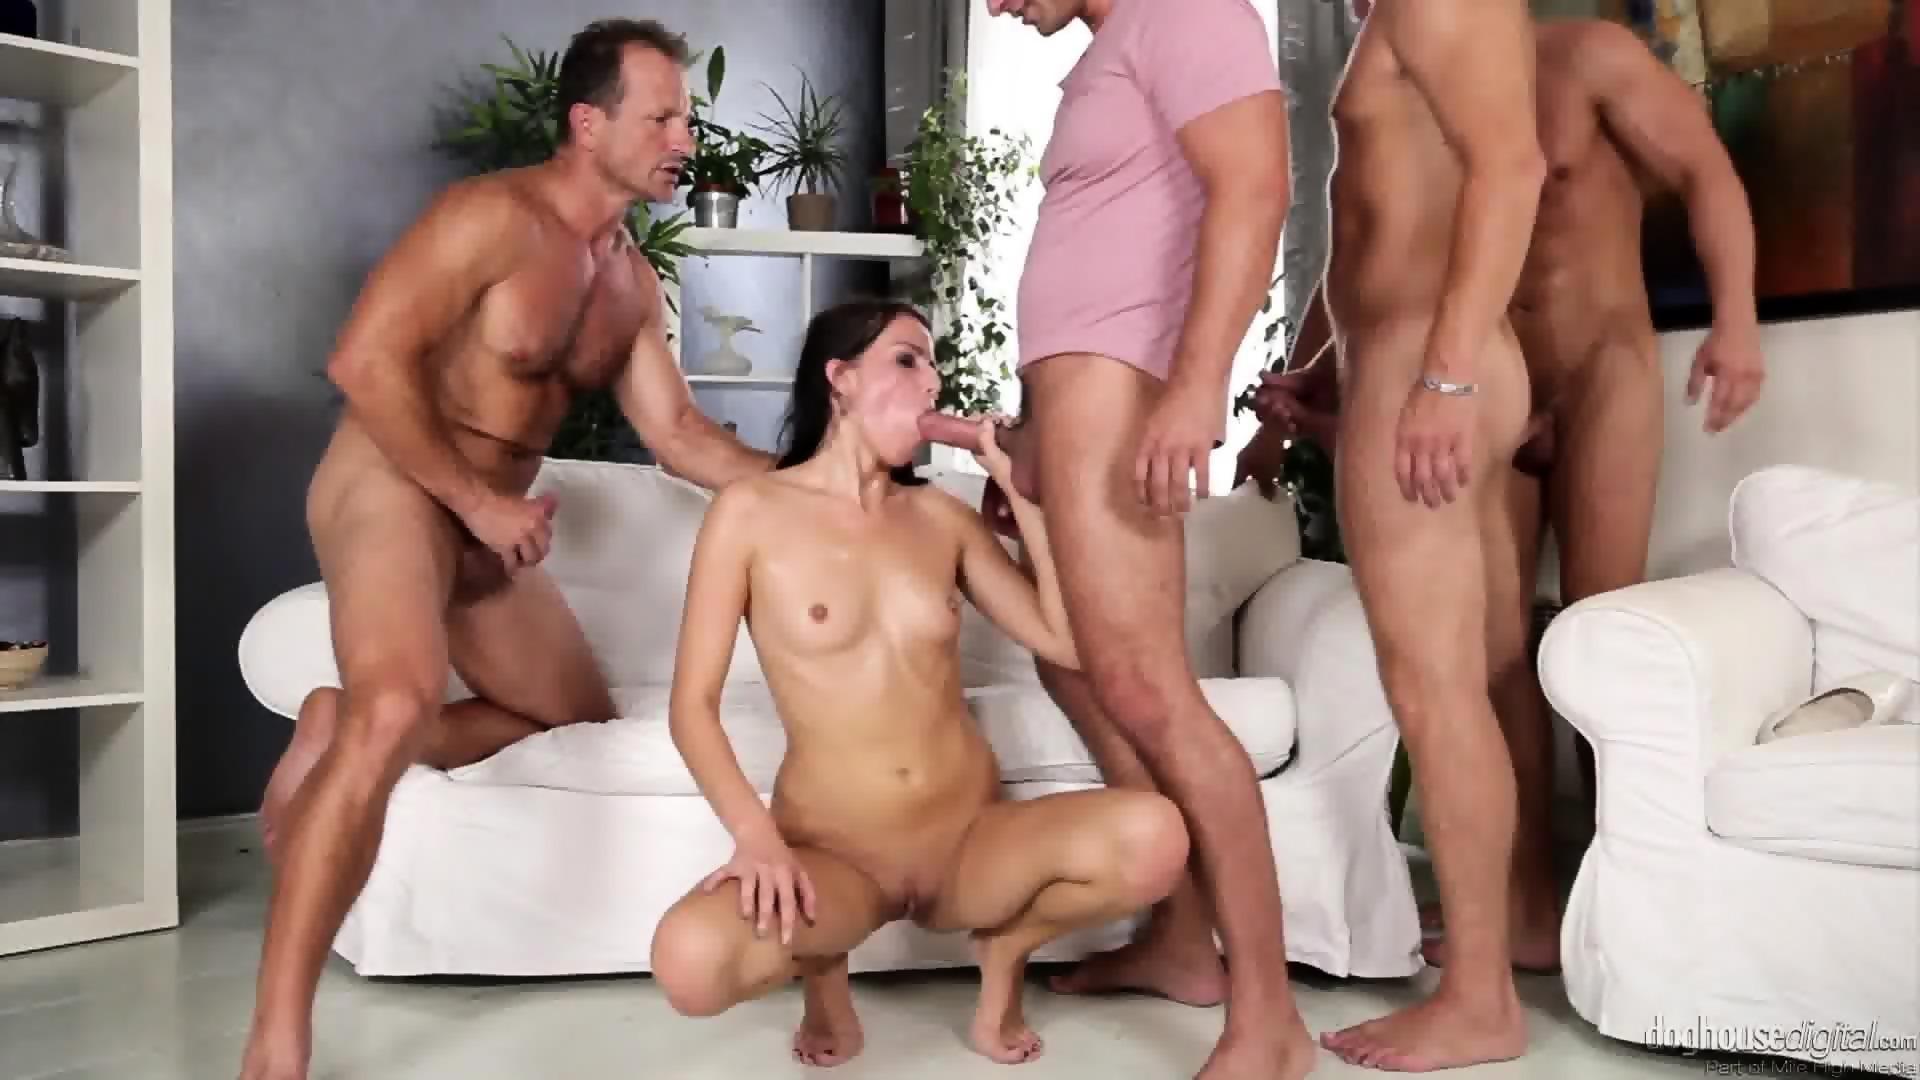 Orgasm contest big dick vs busty petite oc 25f 29m 3